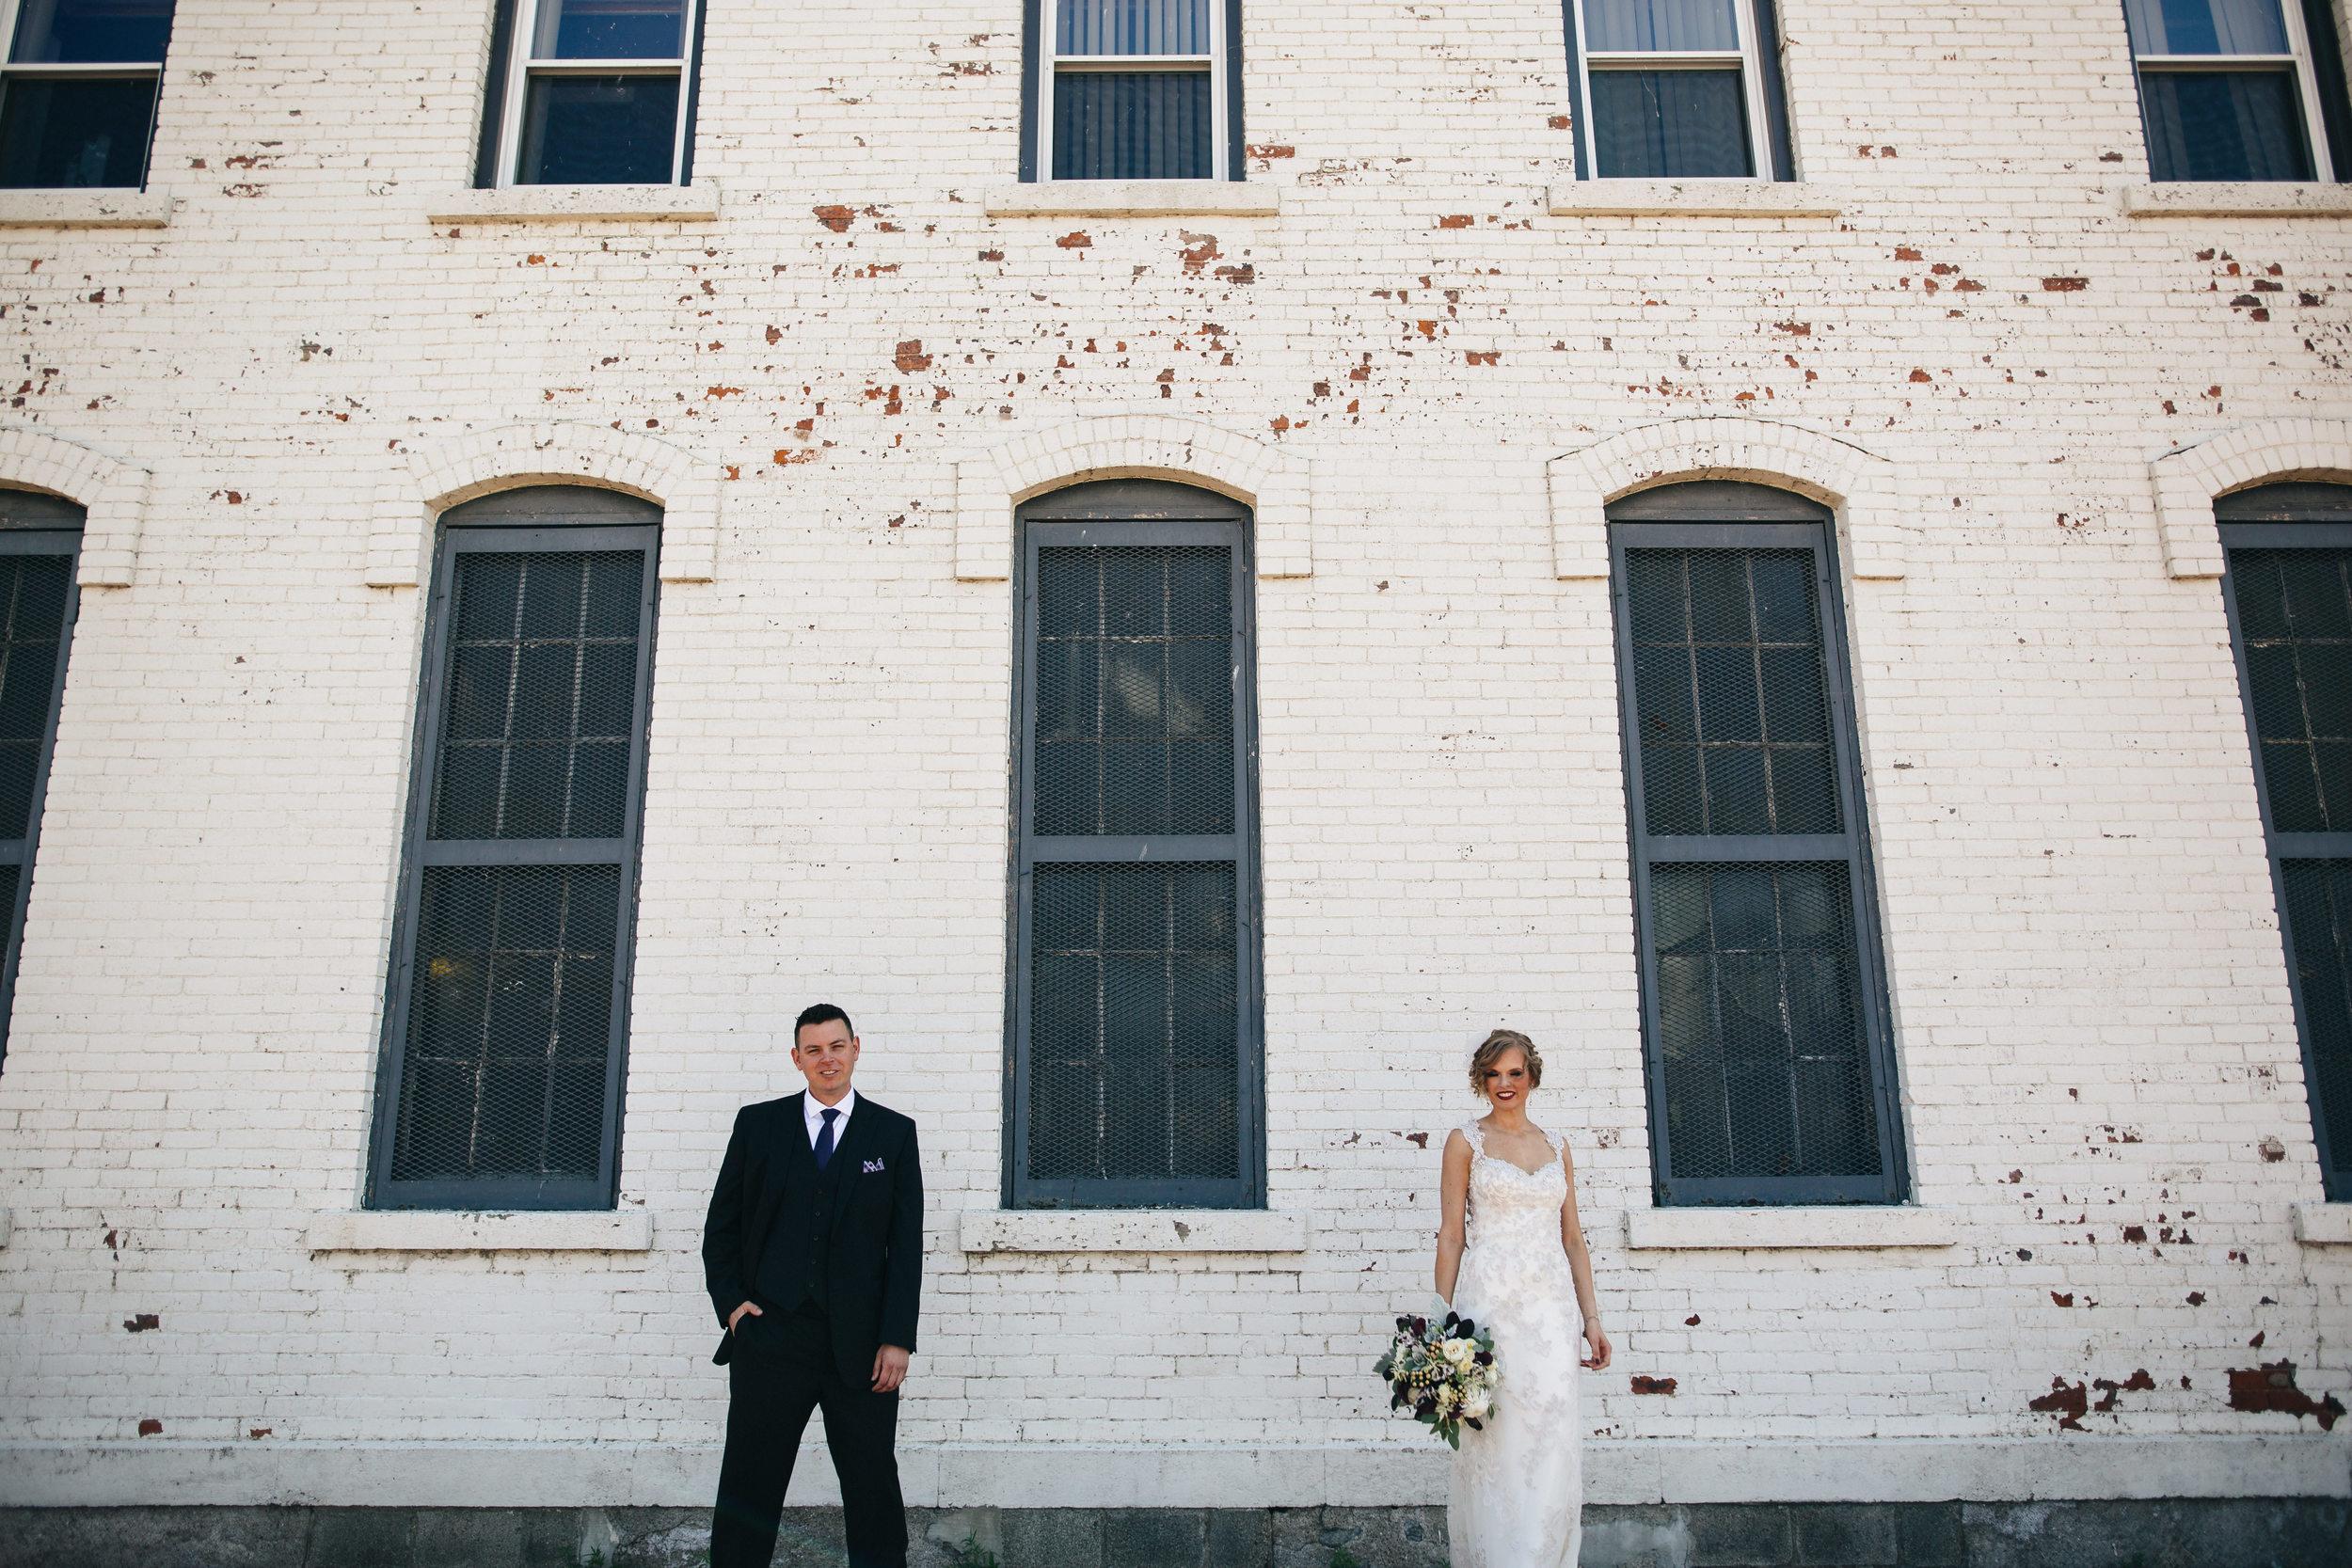 Bride and groom wedding photography in Sandusky, Ohio.